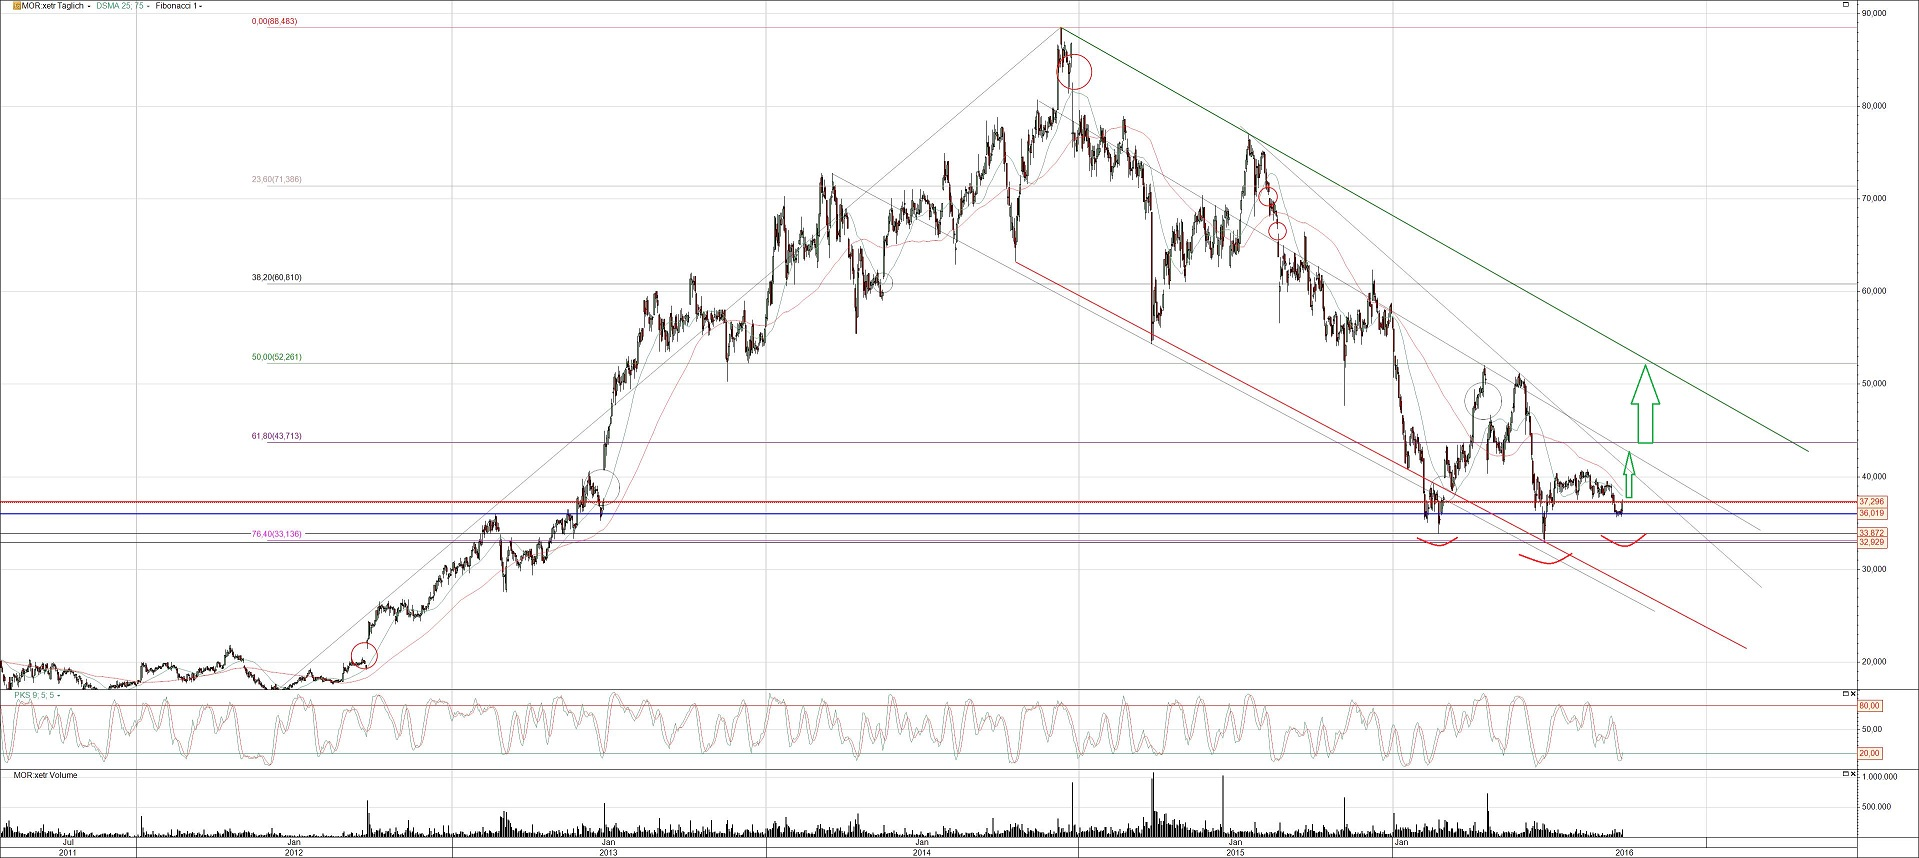 Morphosys Aktie Chart Analyse